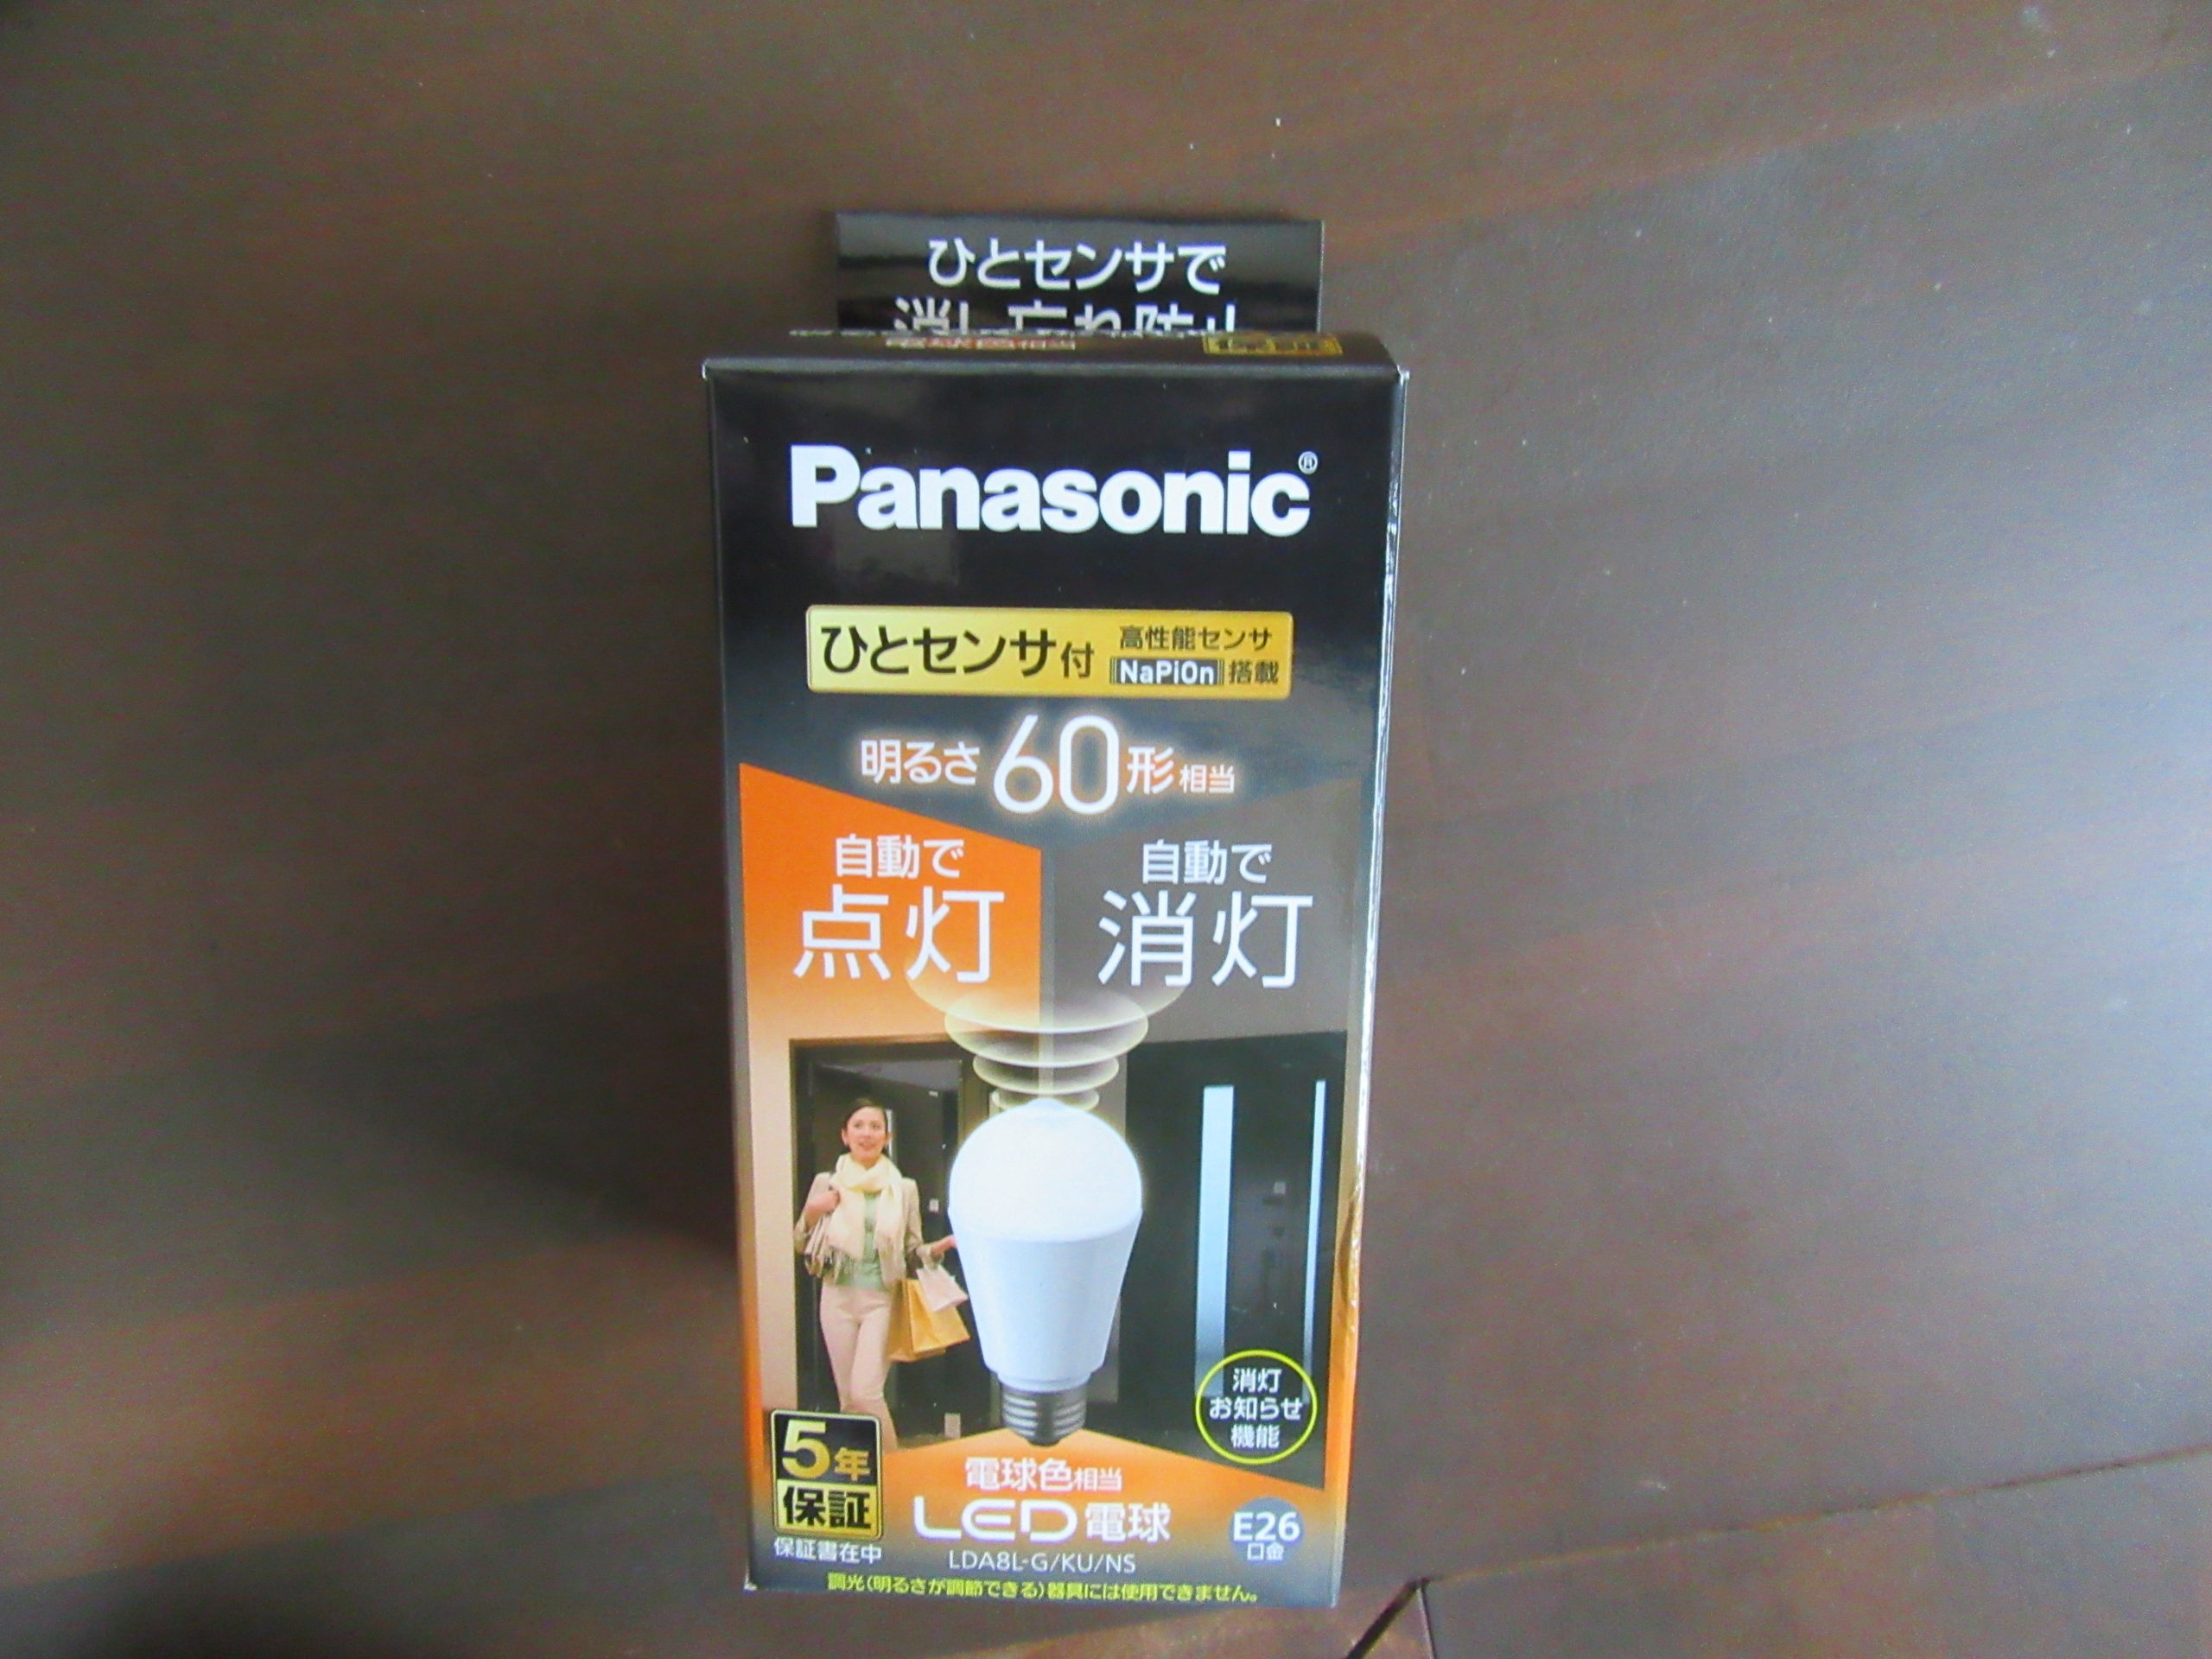 Panasonic LED電球 2 ひとセンサ付き